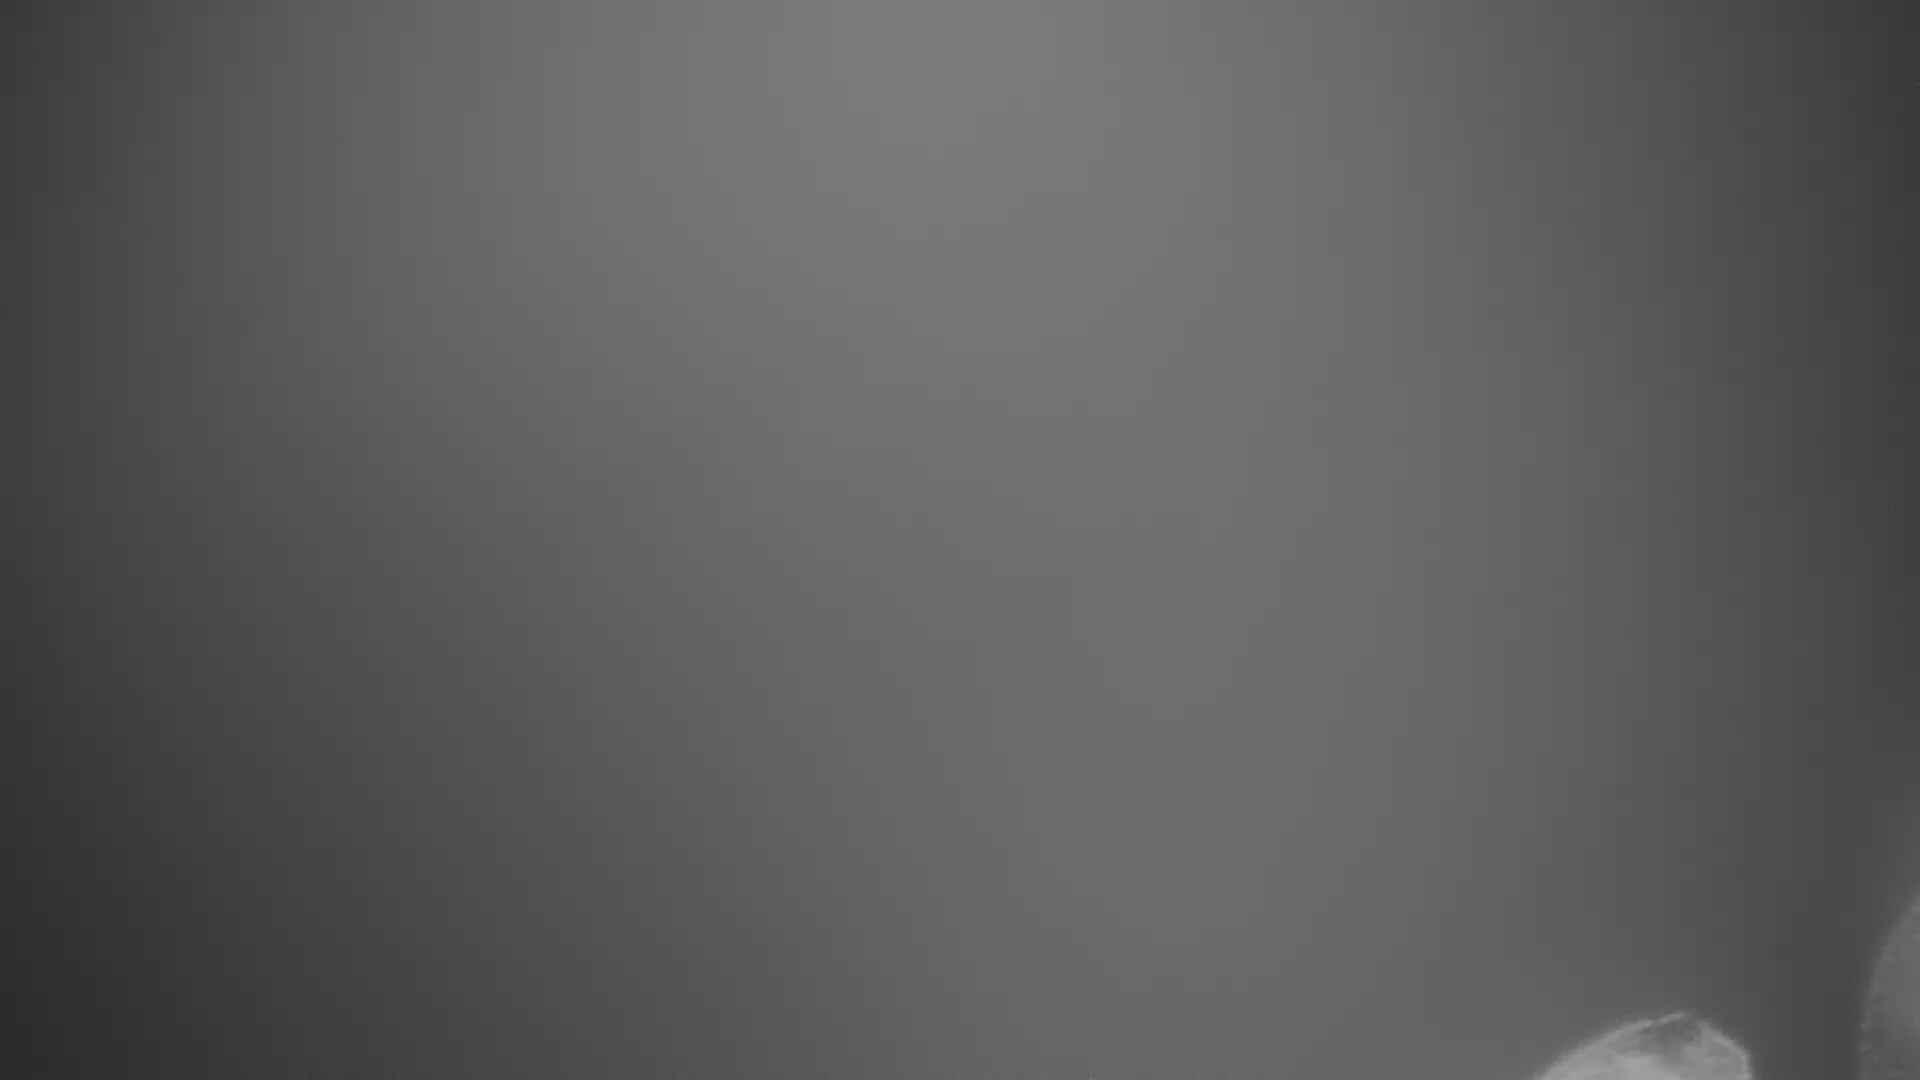 Playa del Ingles (Gran Canaria) Sat. 21:36